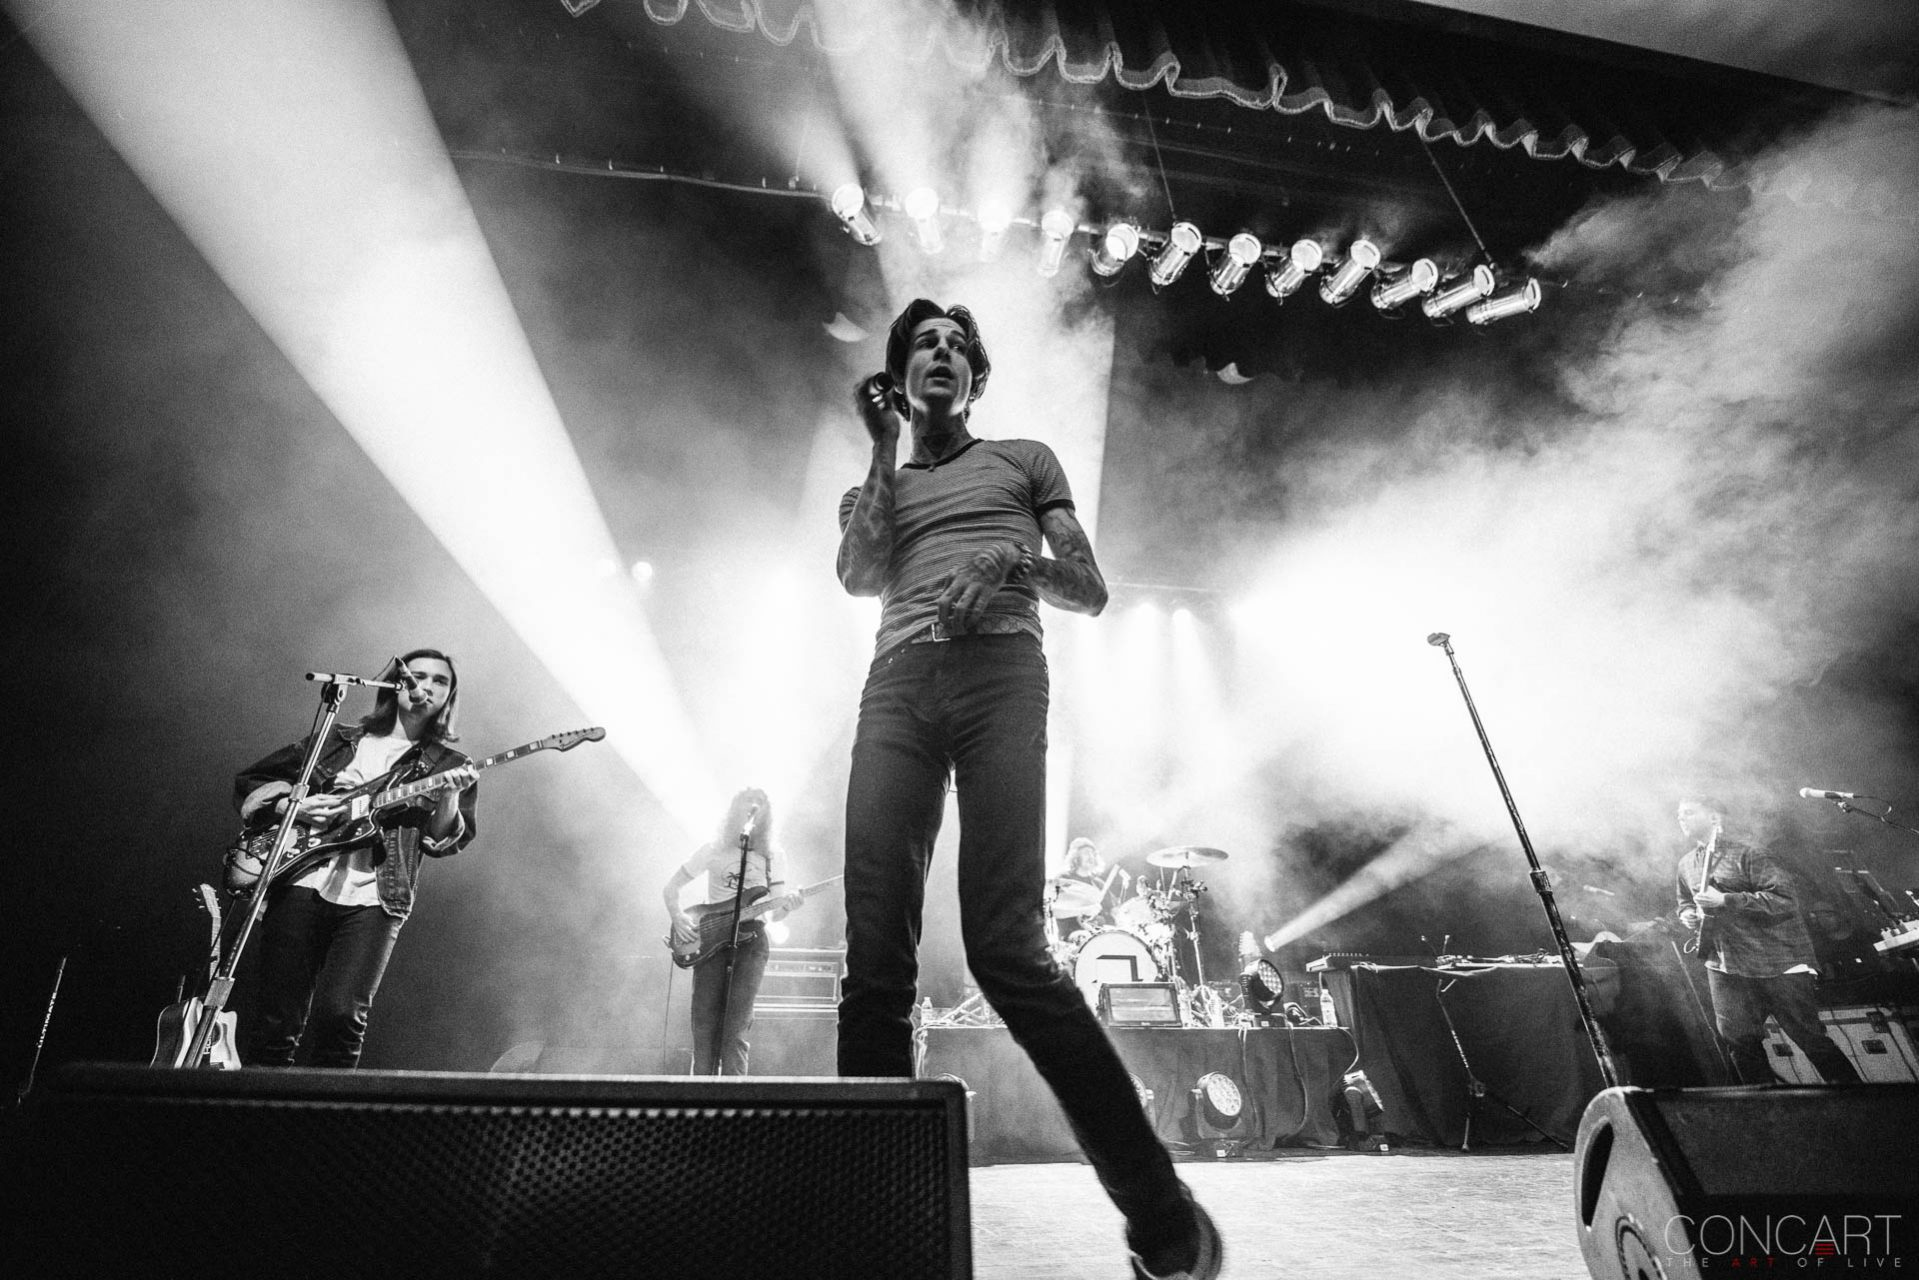 Concert Photos: The Neighbourhood @ The Egyptian Room — Indy 2016 ...